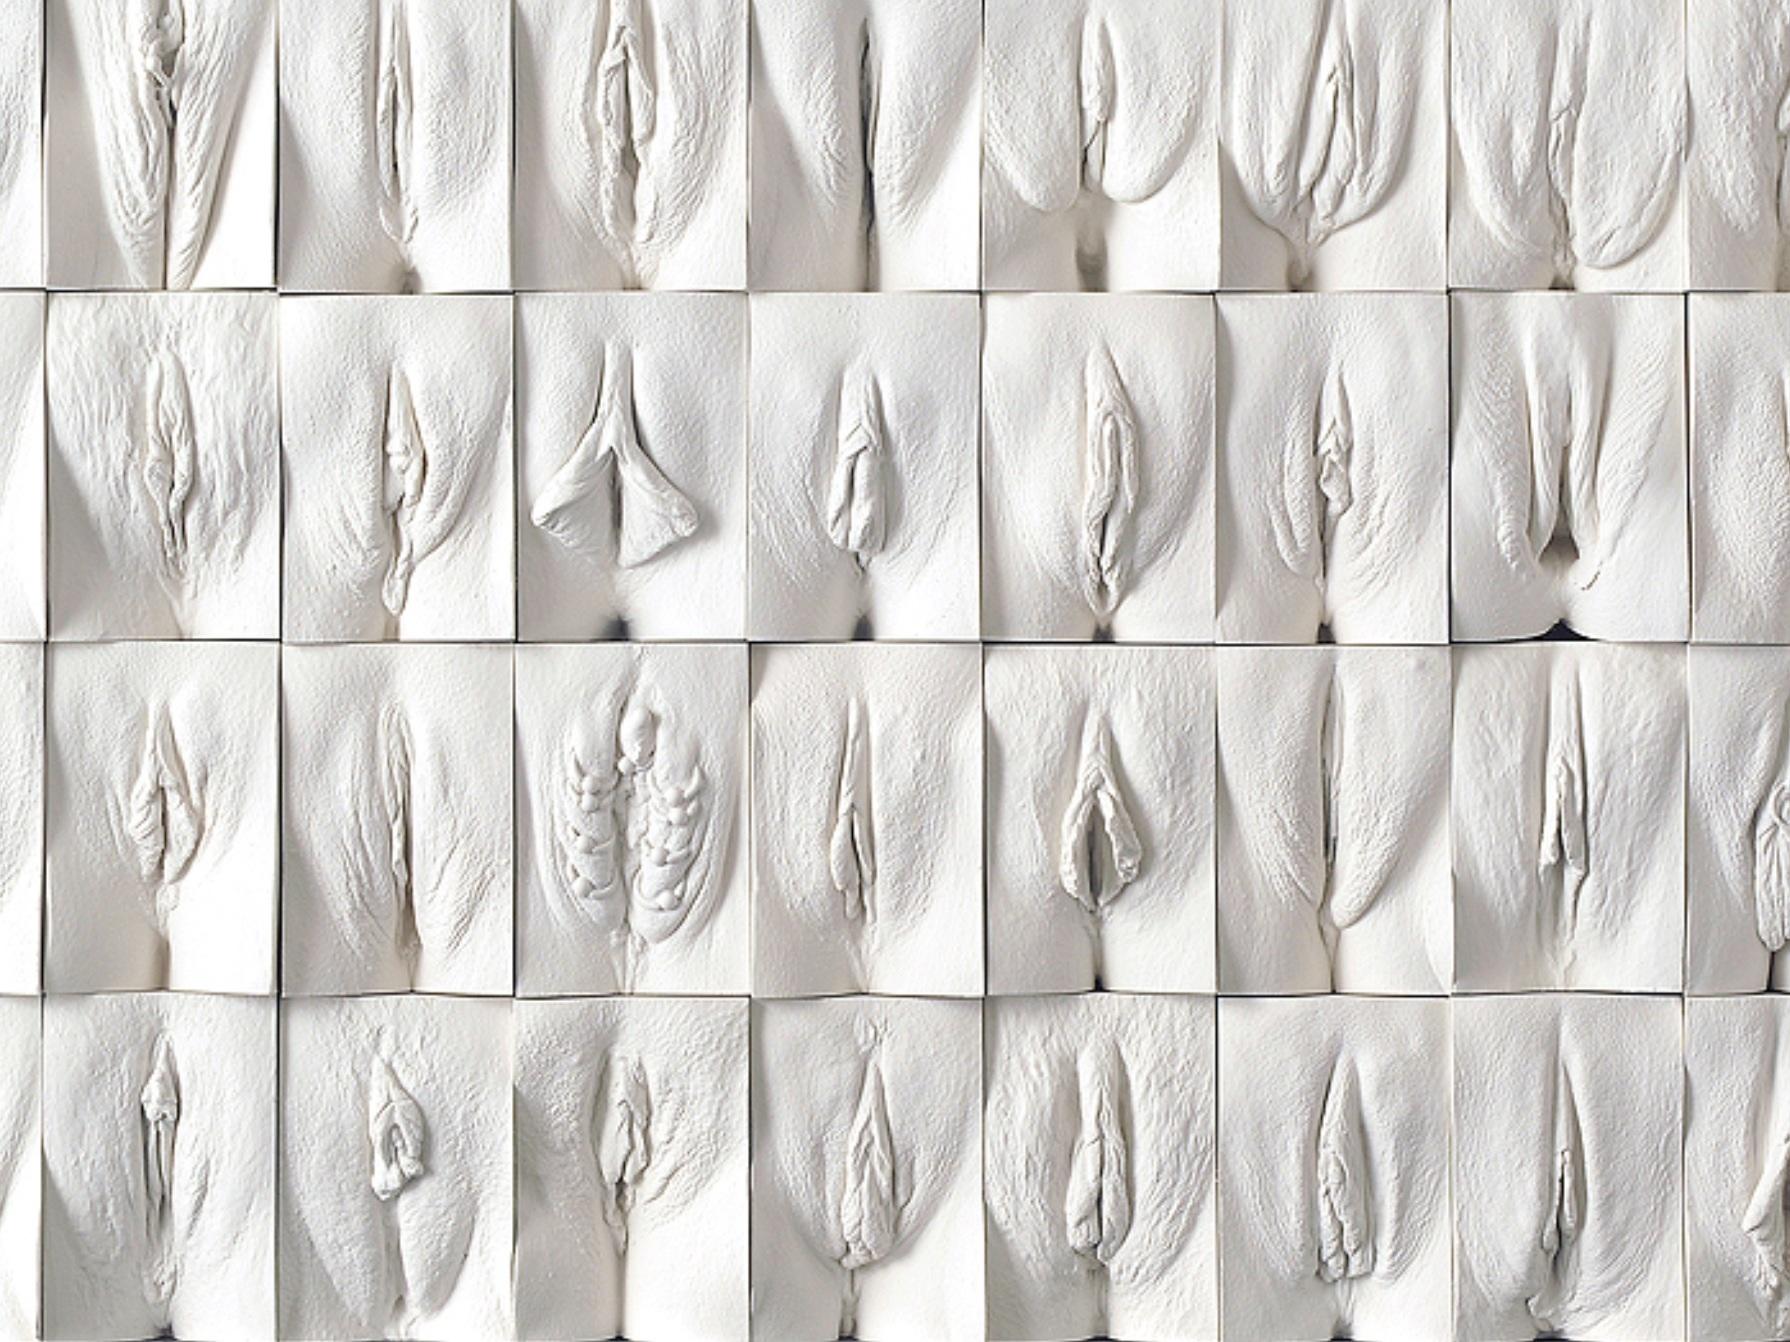 Jamie McCartney - Great Wall of Vagina (2014)